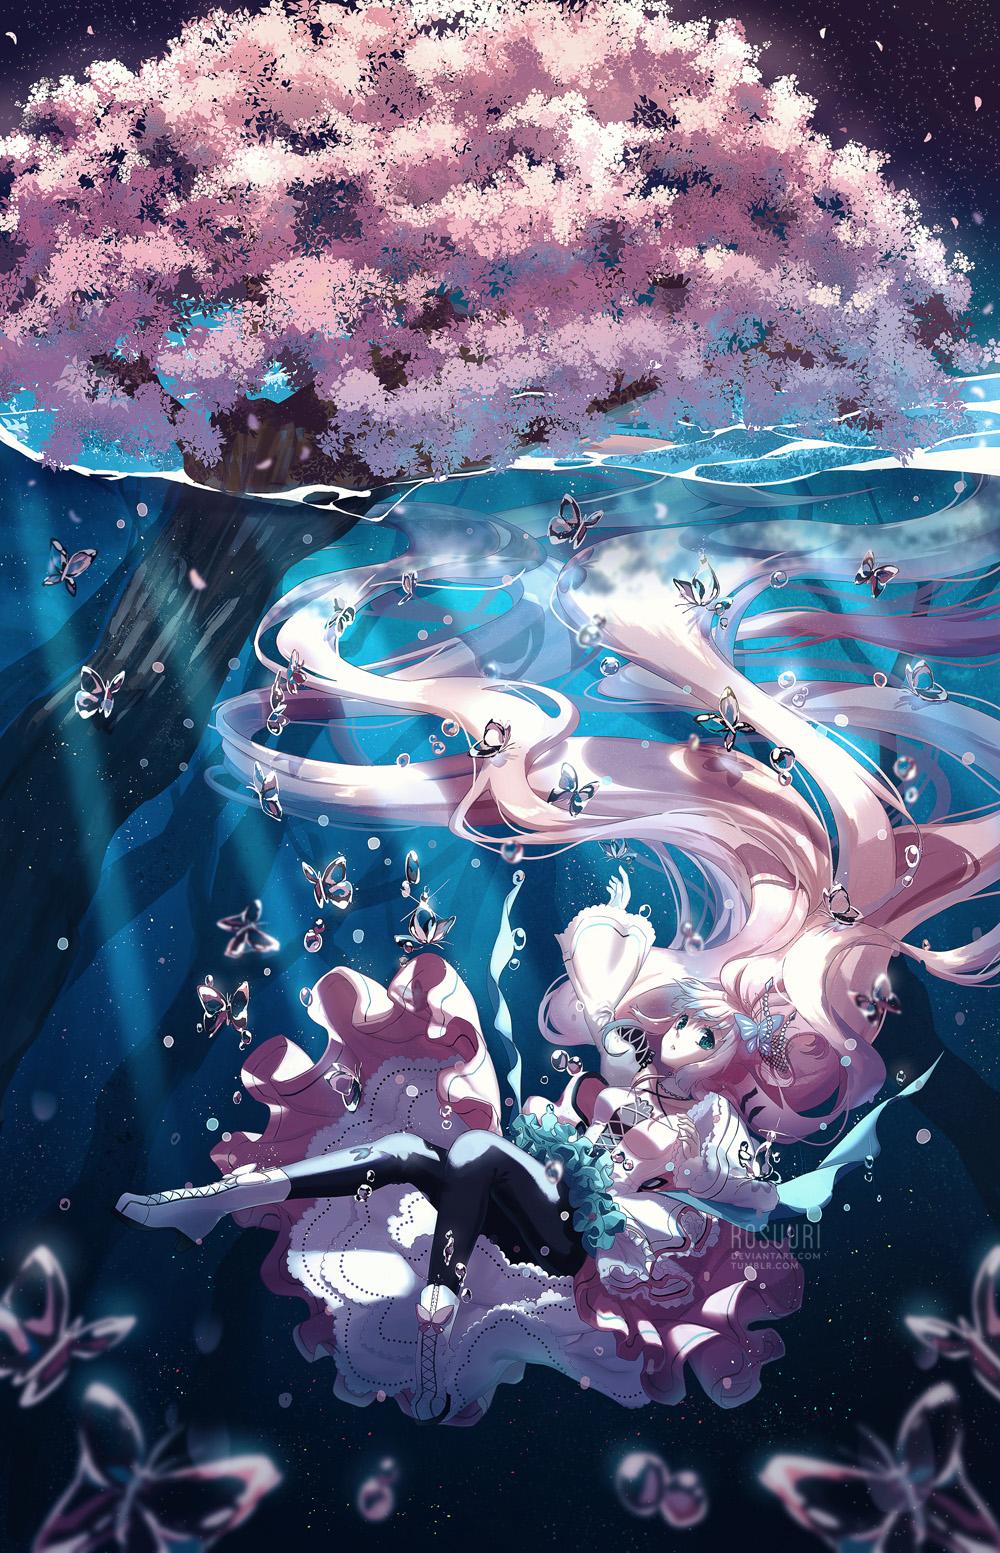 Commission - Underwater Spring